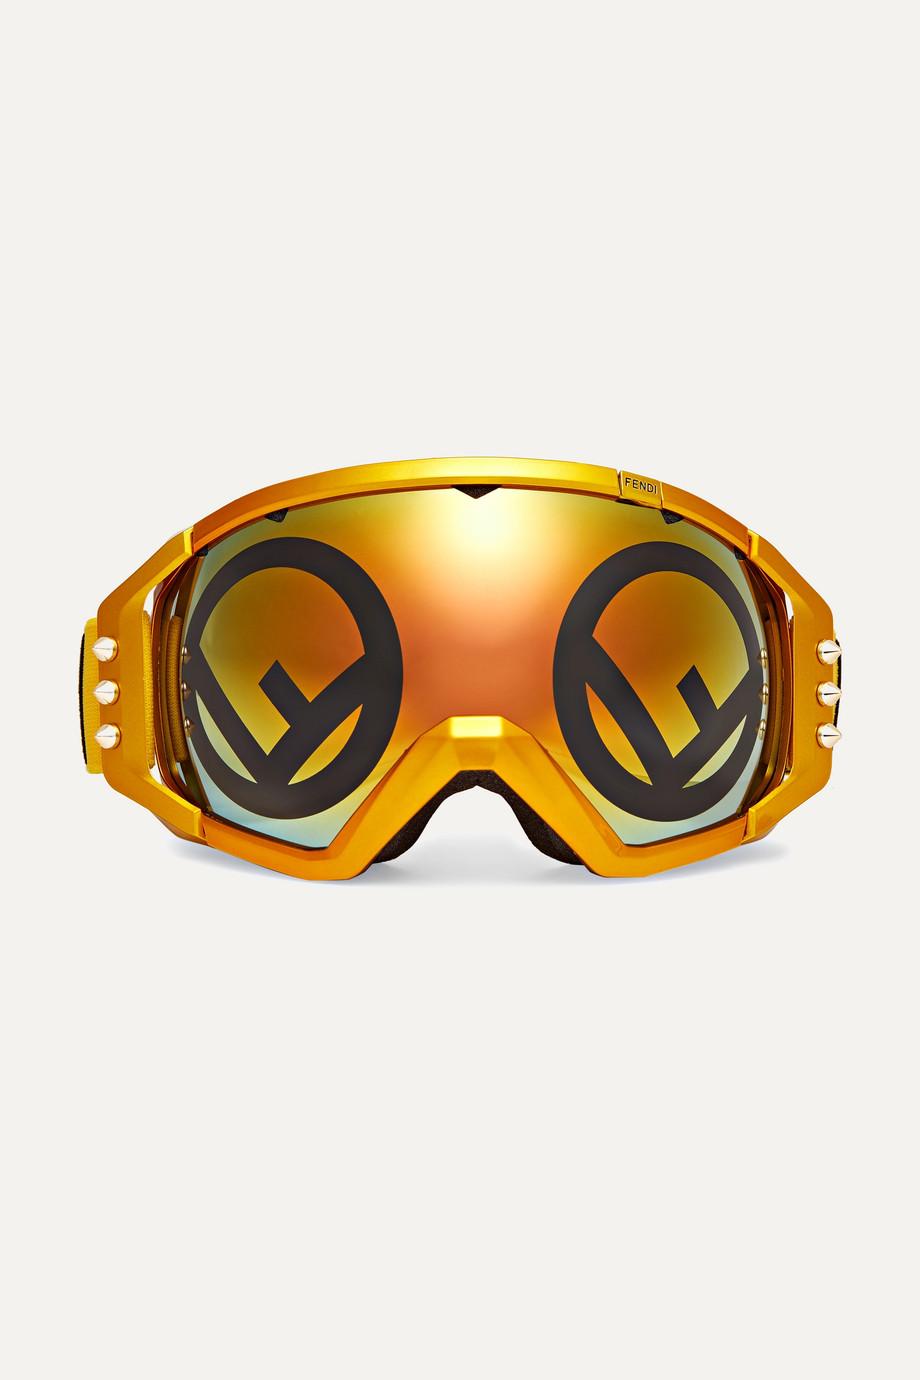 Fendi Golden Roma mirrored metallic ski goggles